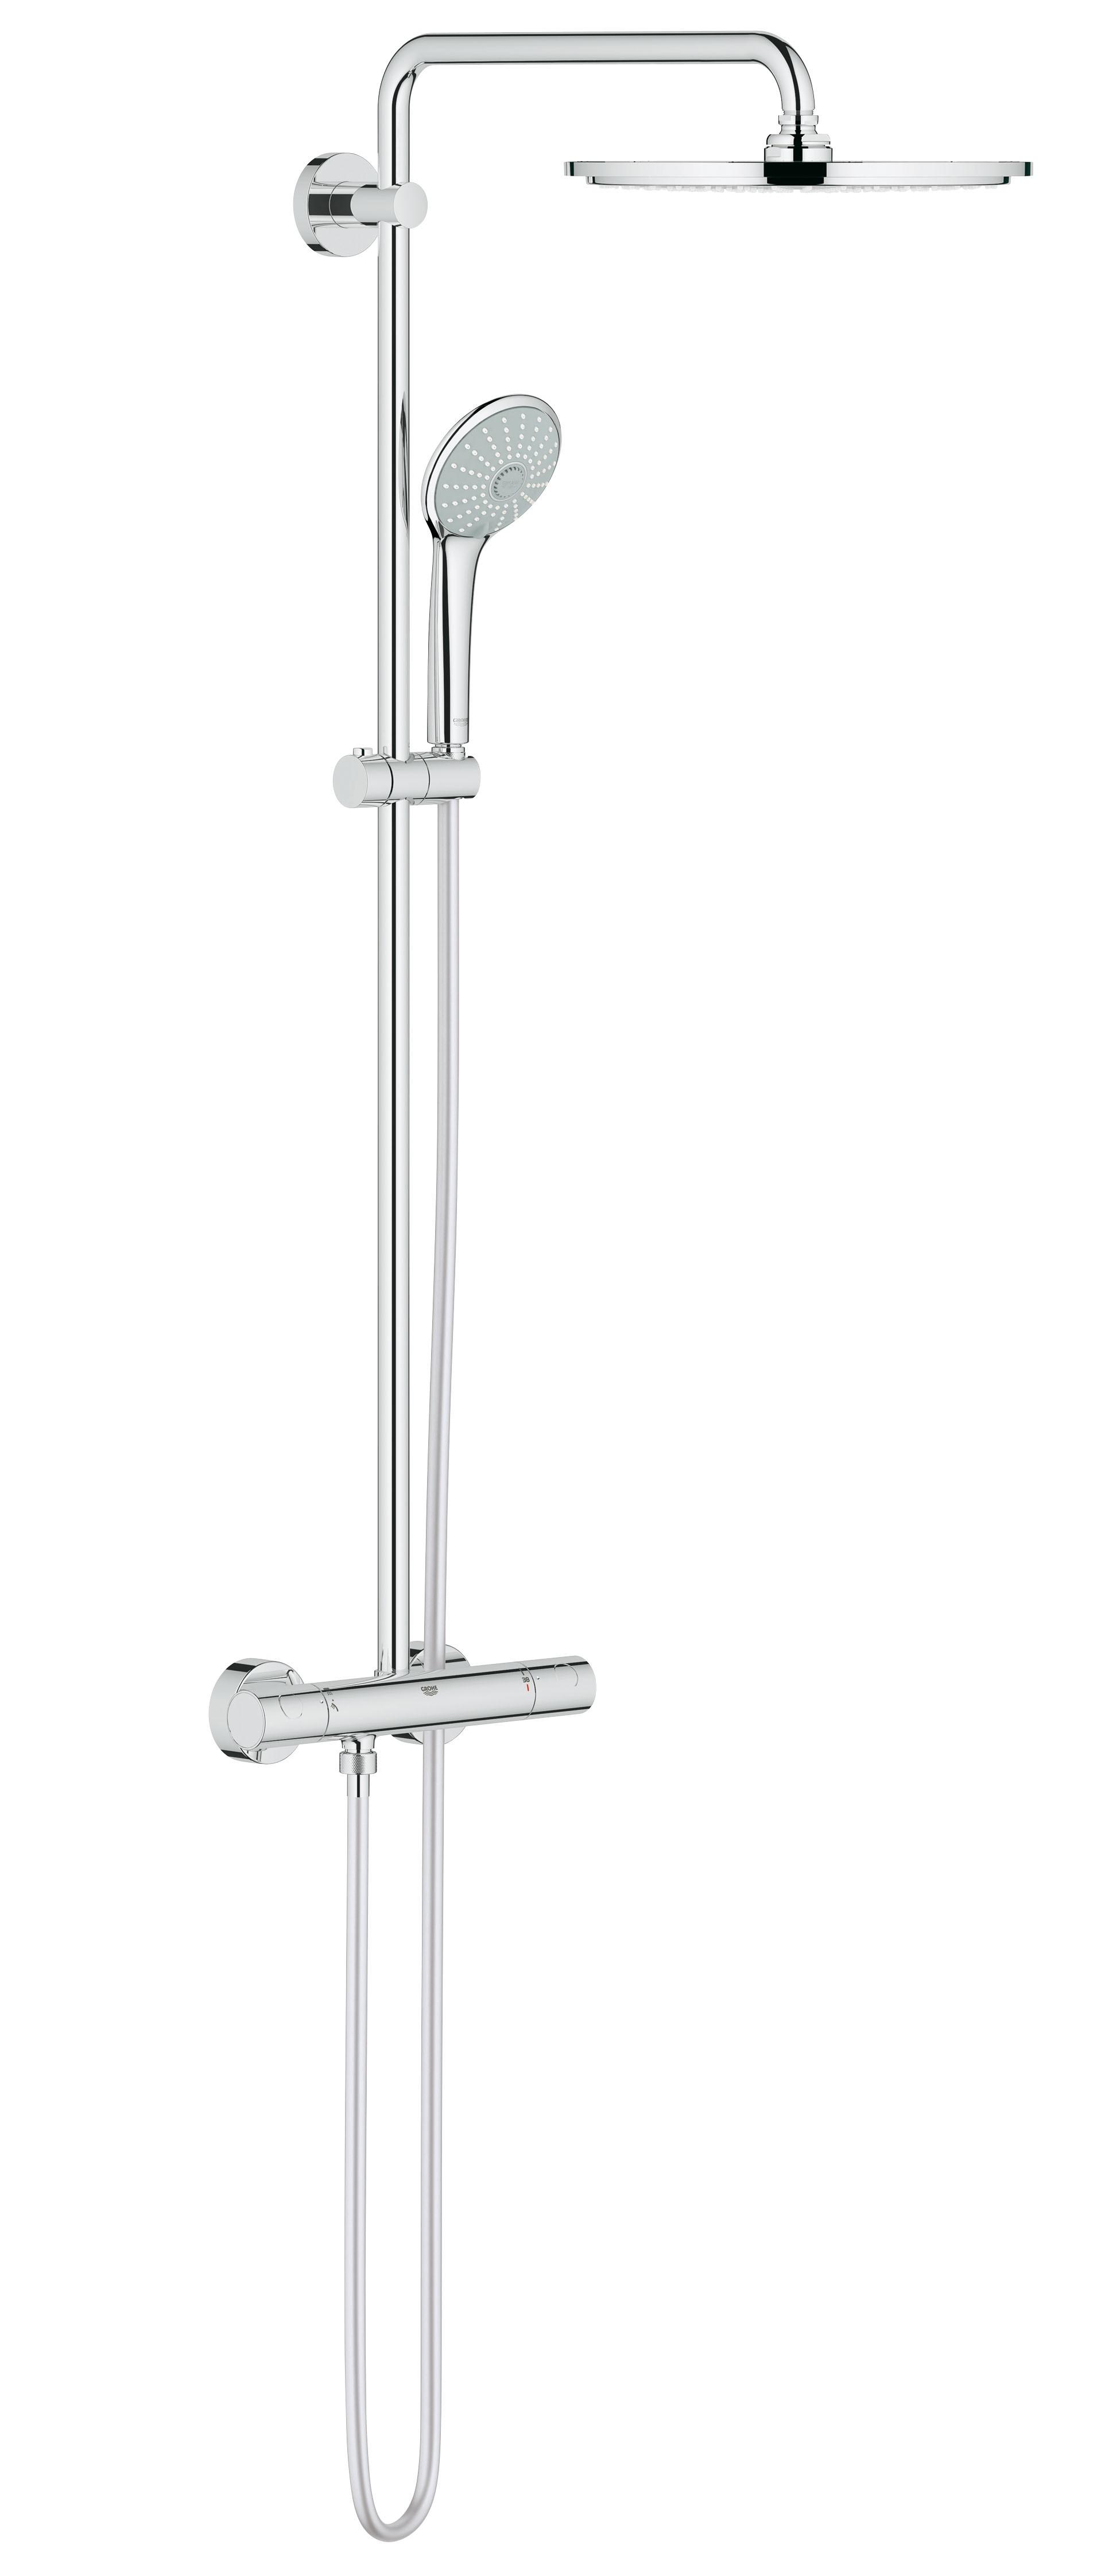 Душевая система Grohe 26075000 Euphoria 310 с верхним и ручным душем, хром